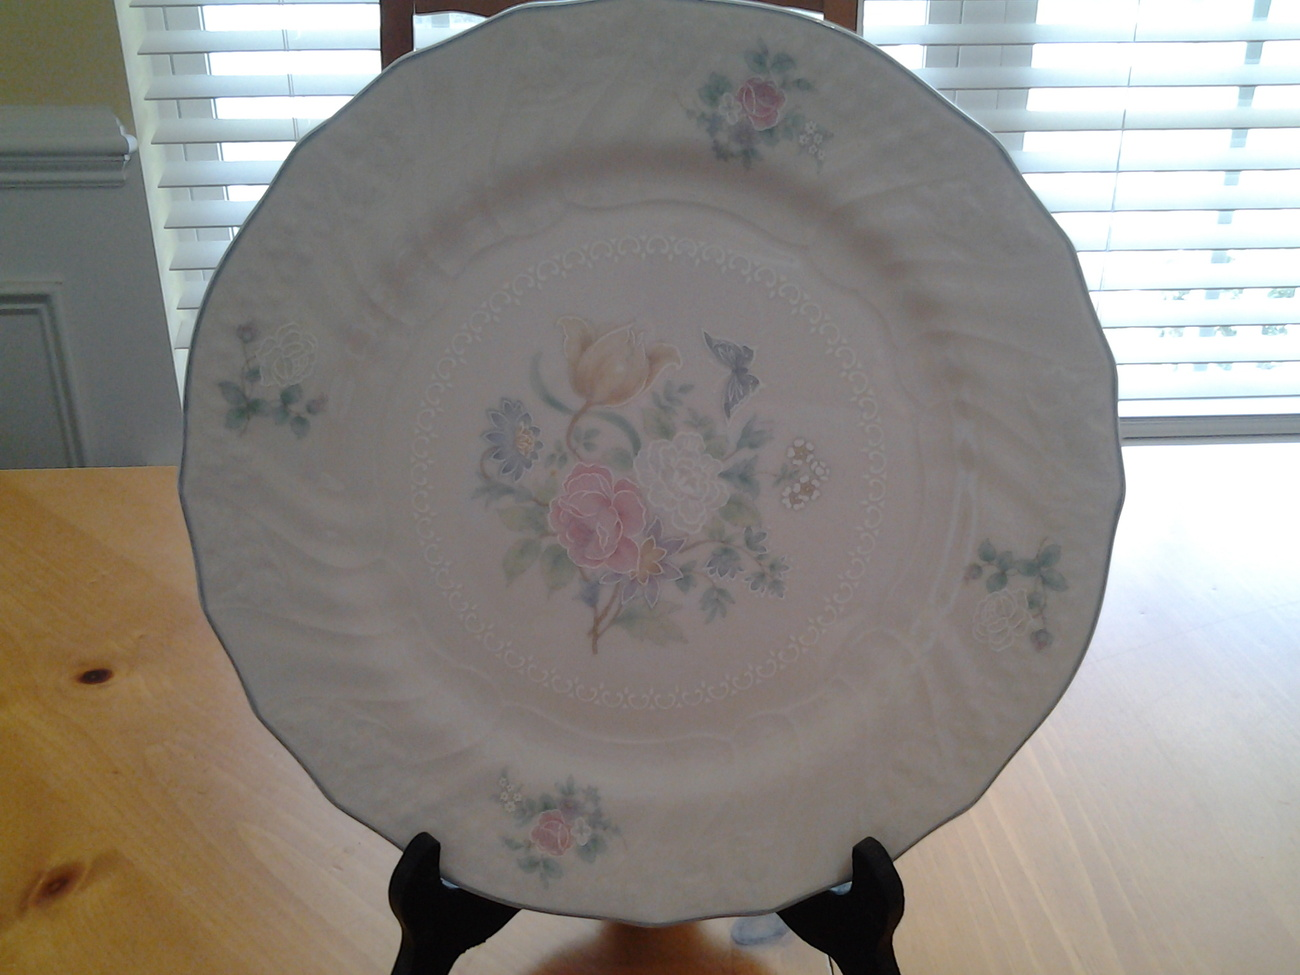 Royal doultonvalencia plate 10.752